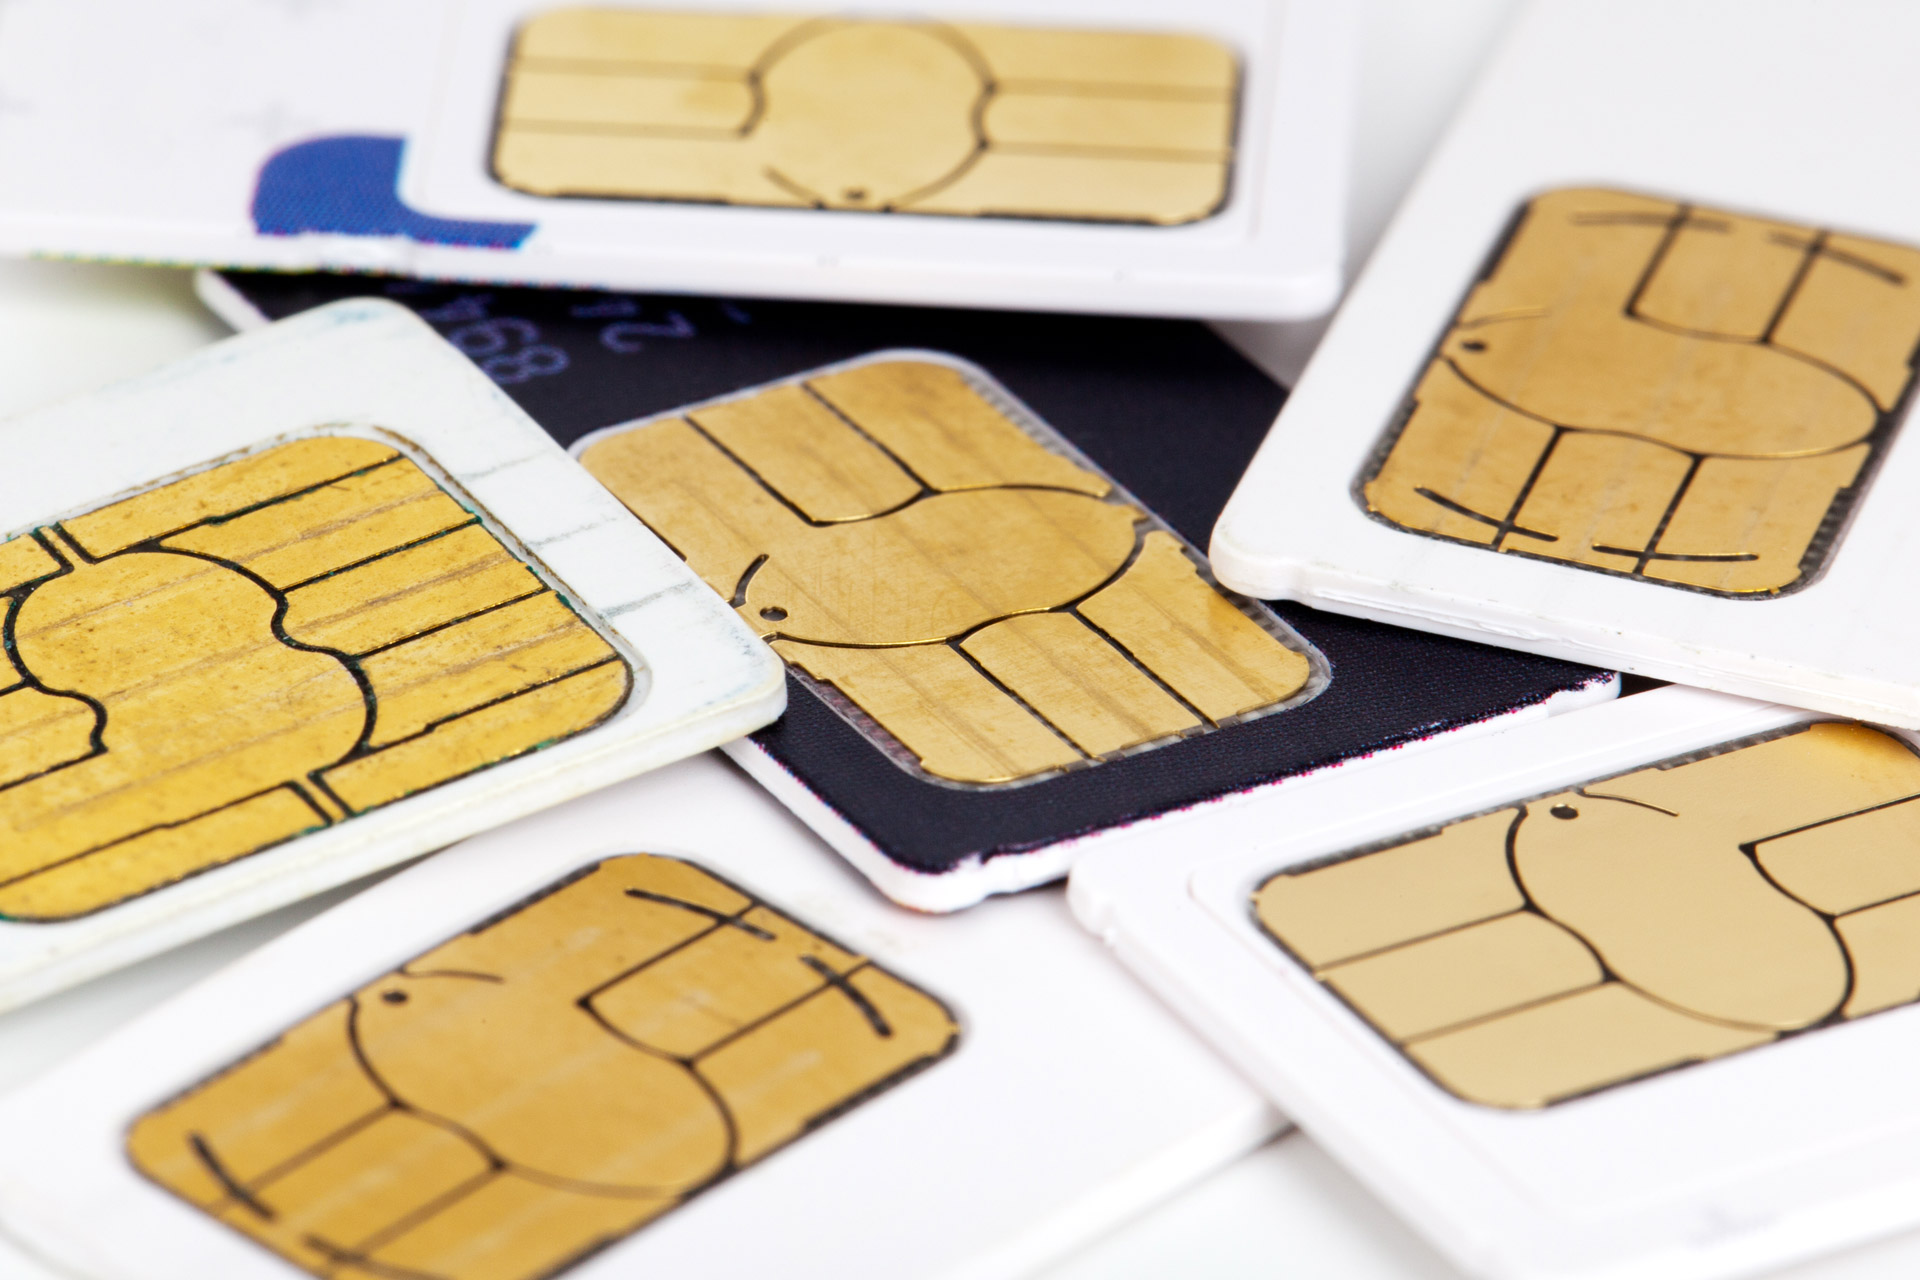 Brzy se objeví mobil na 3 SIM karty